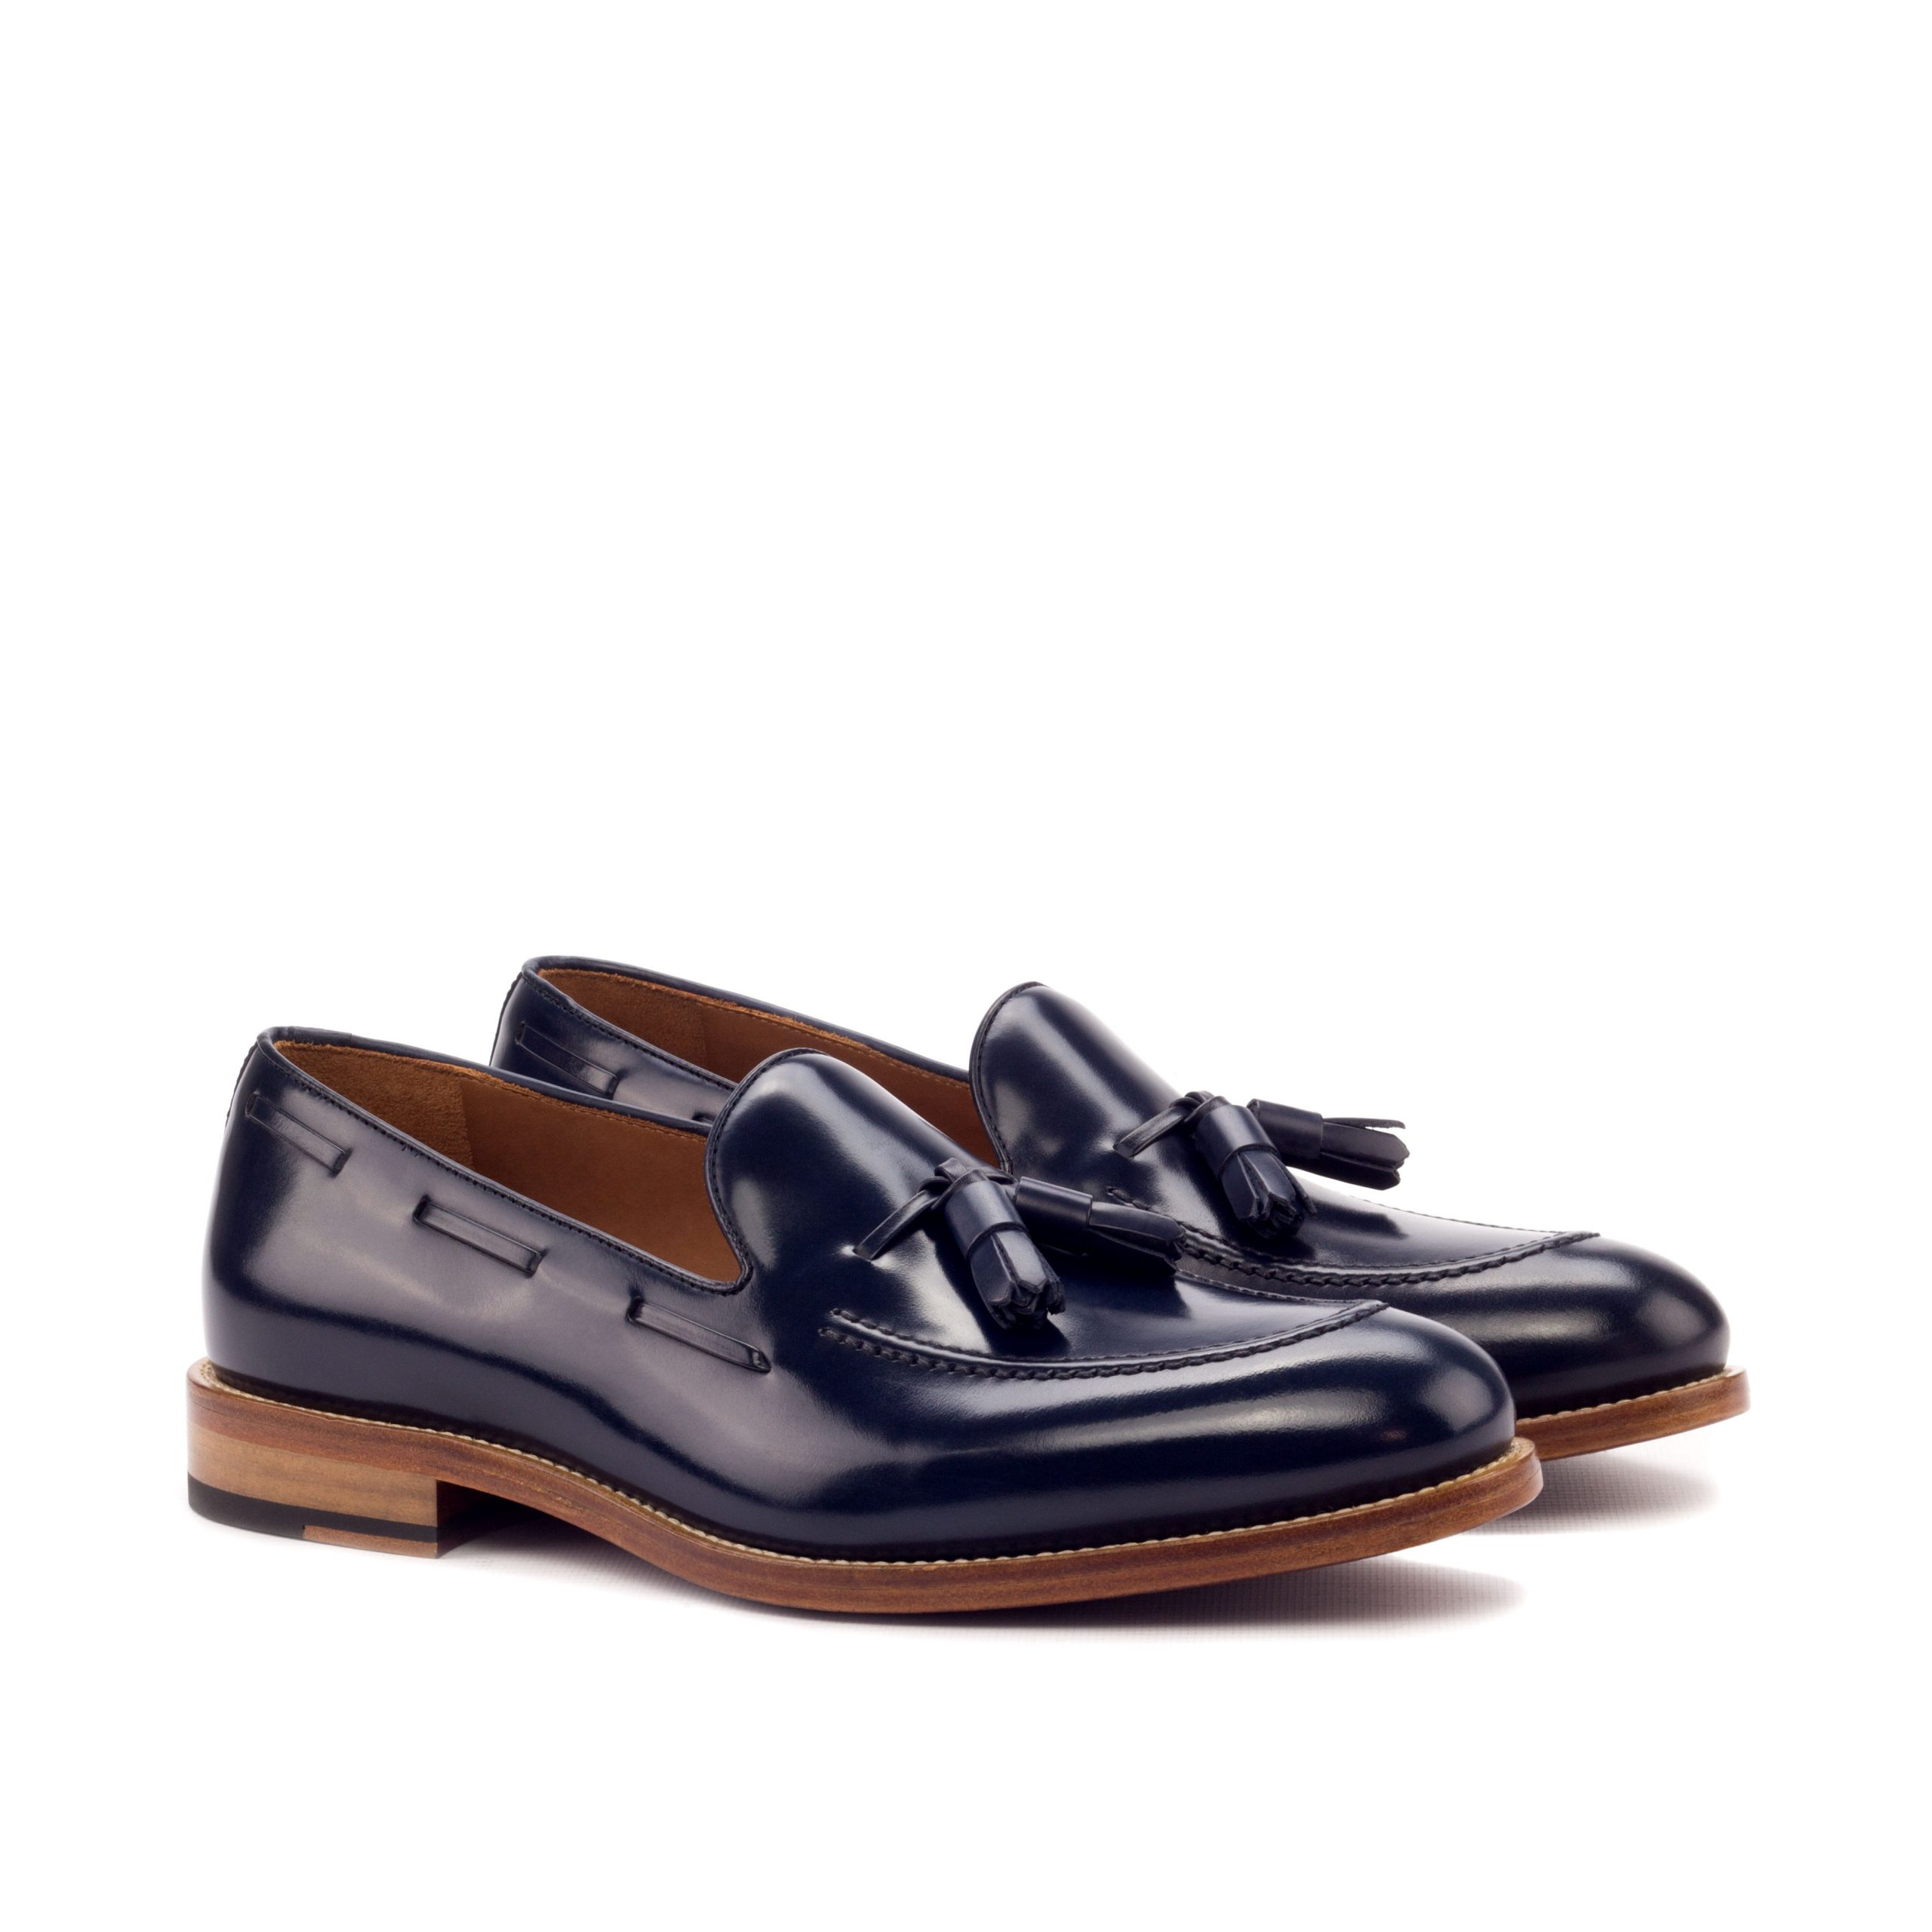 Loafer Tassels - Polished Calf Navy-Ang5